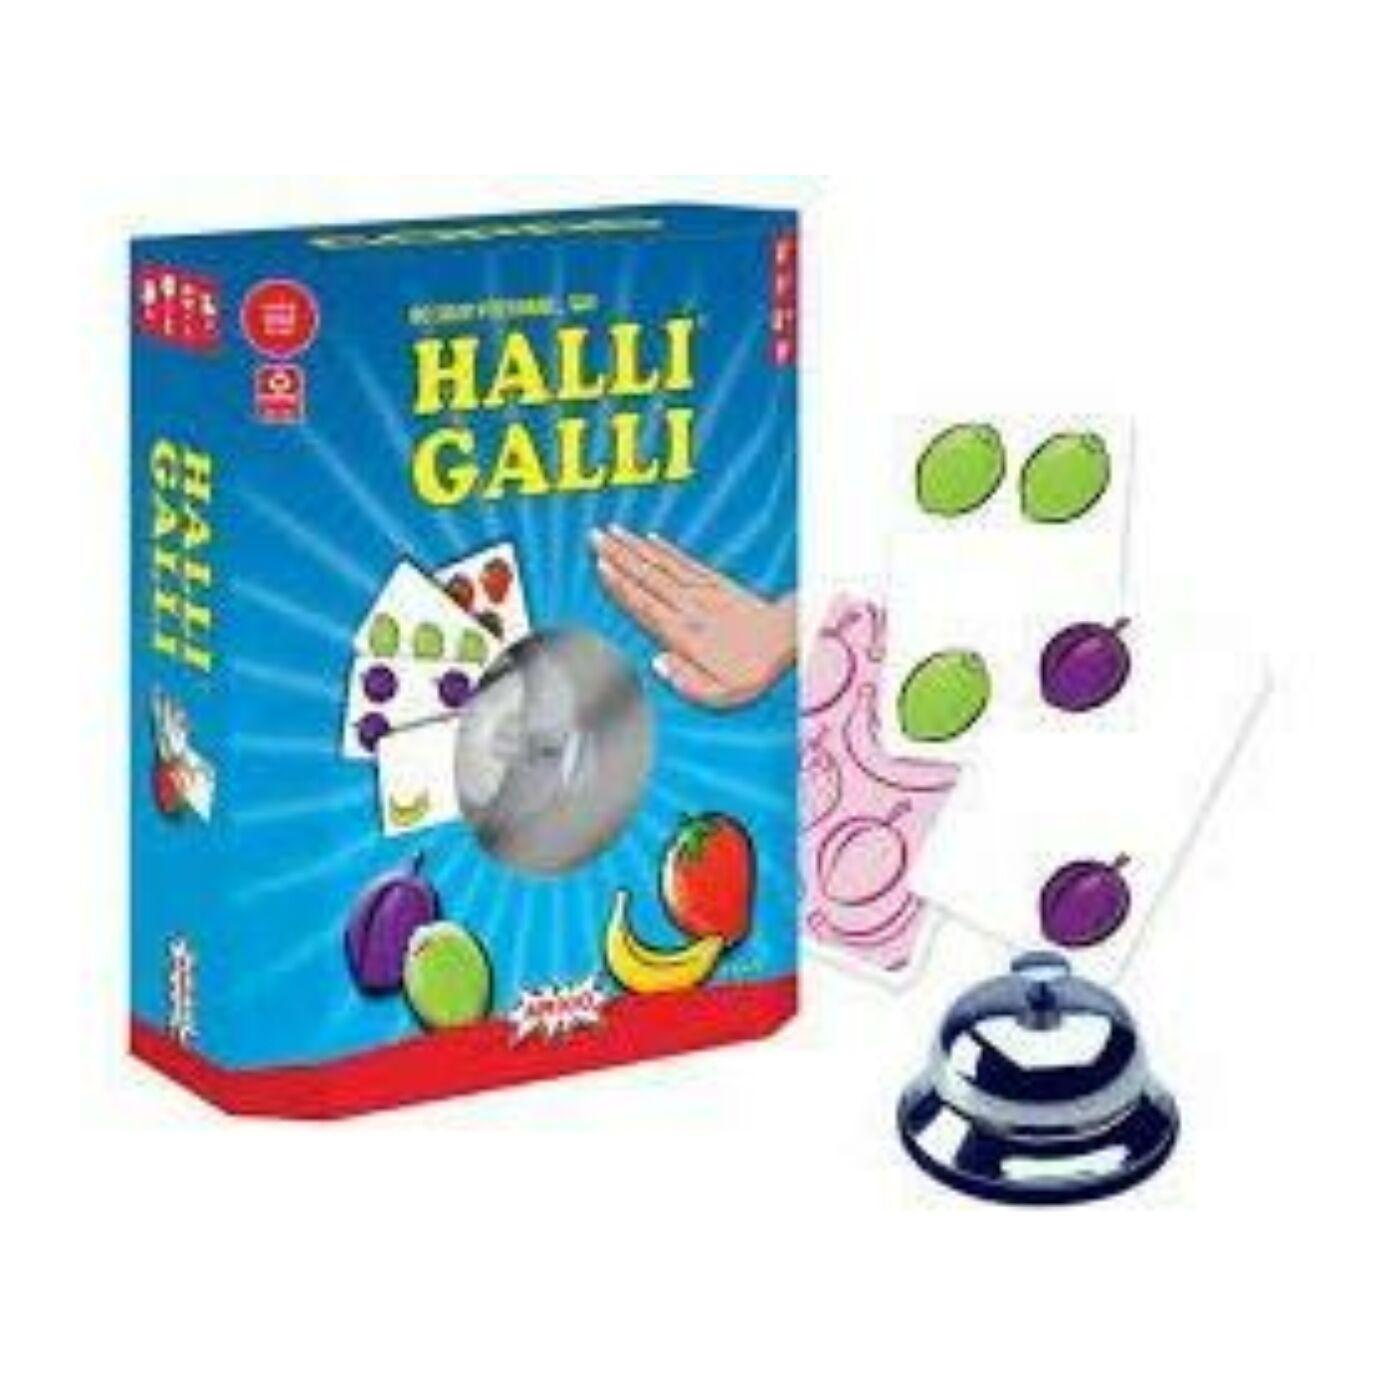 Halli Galli 7404